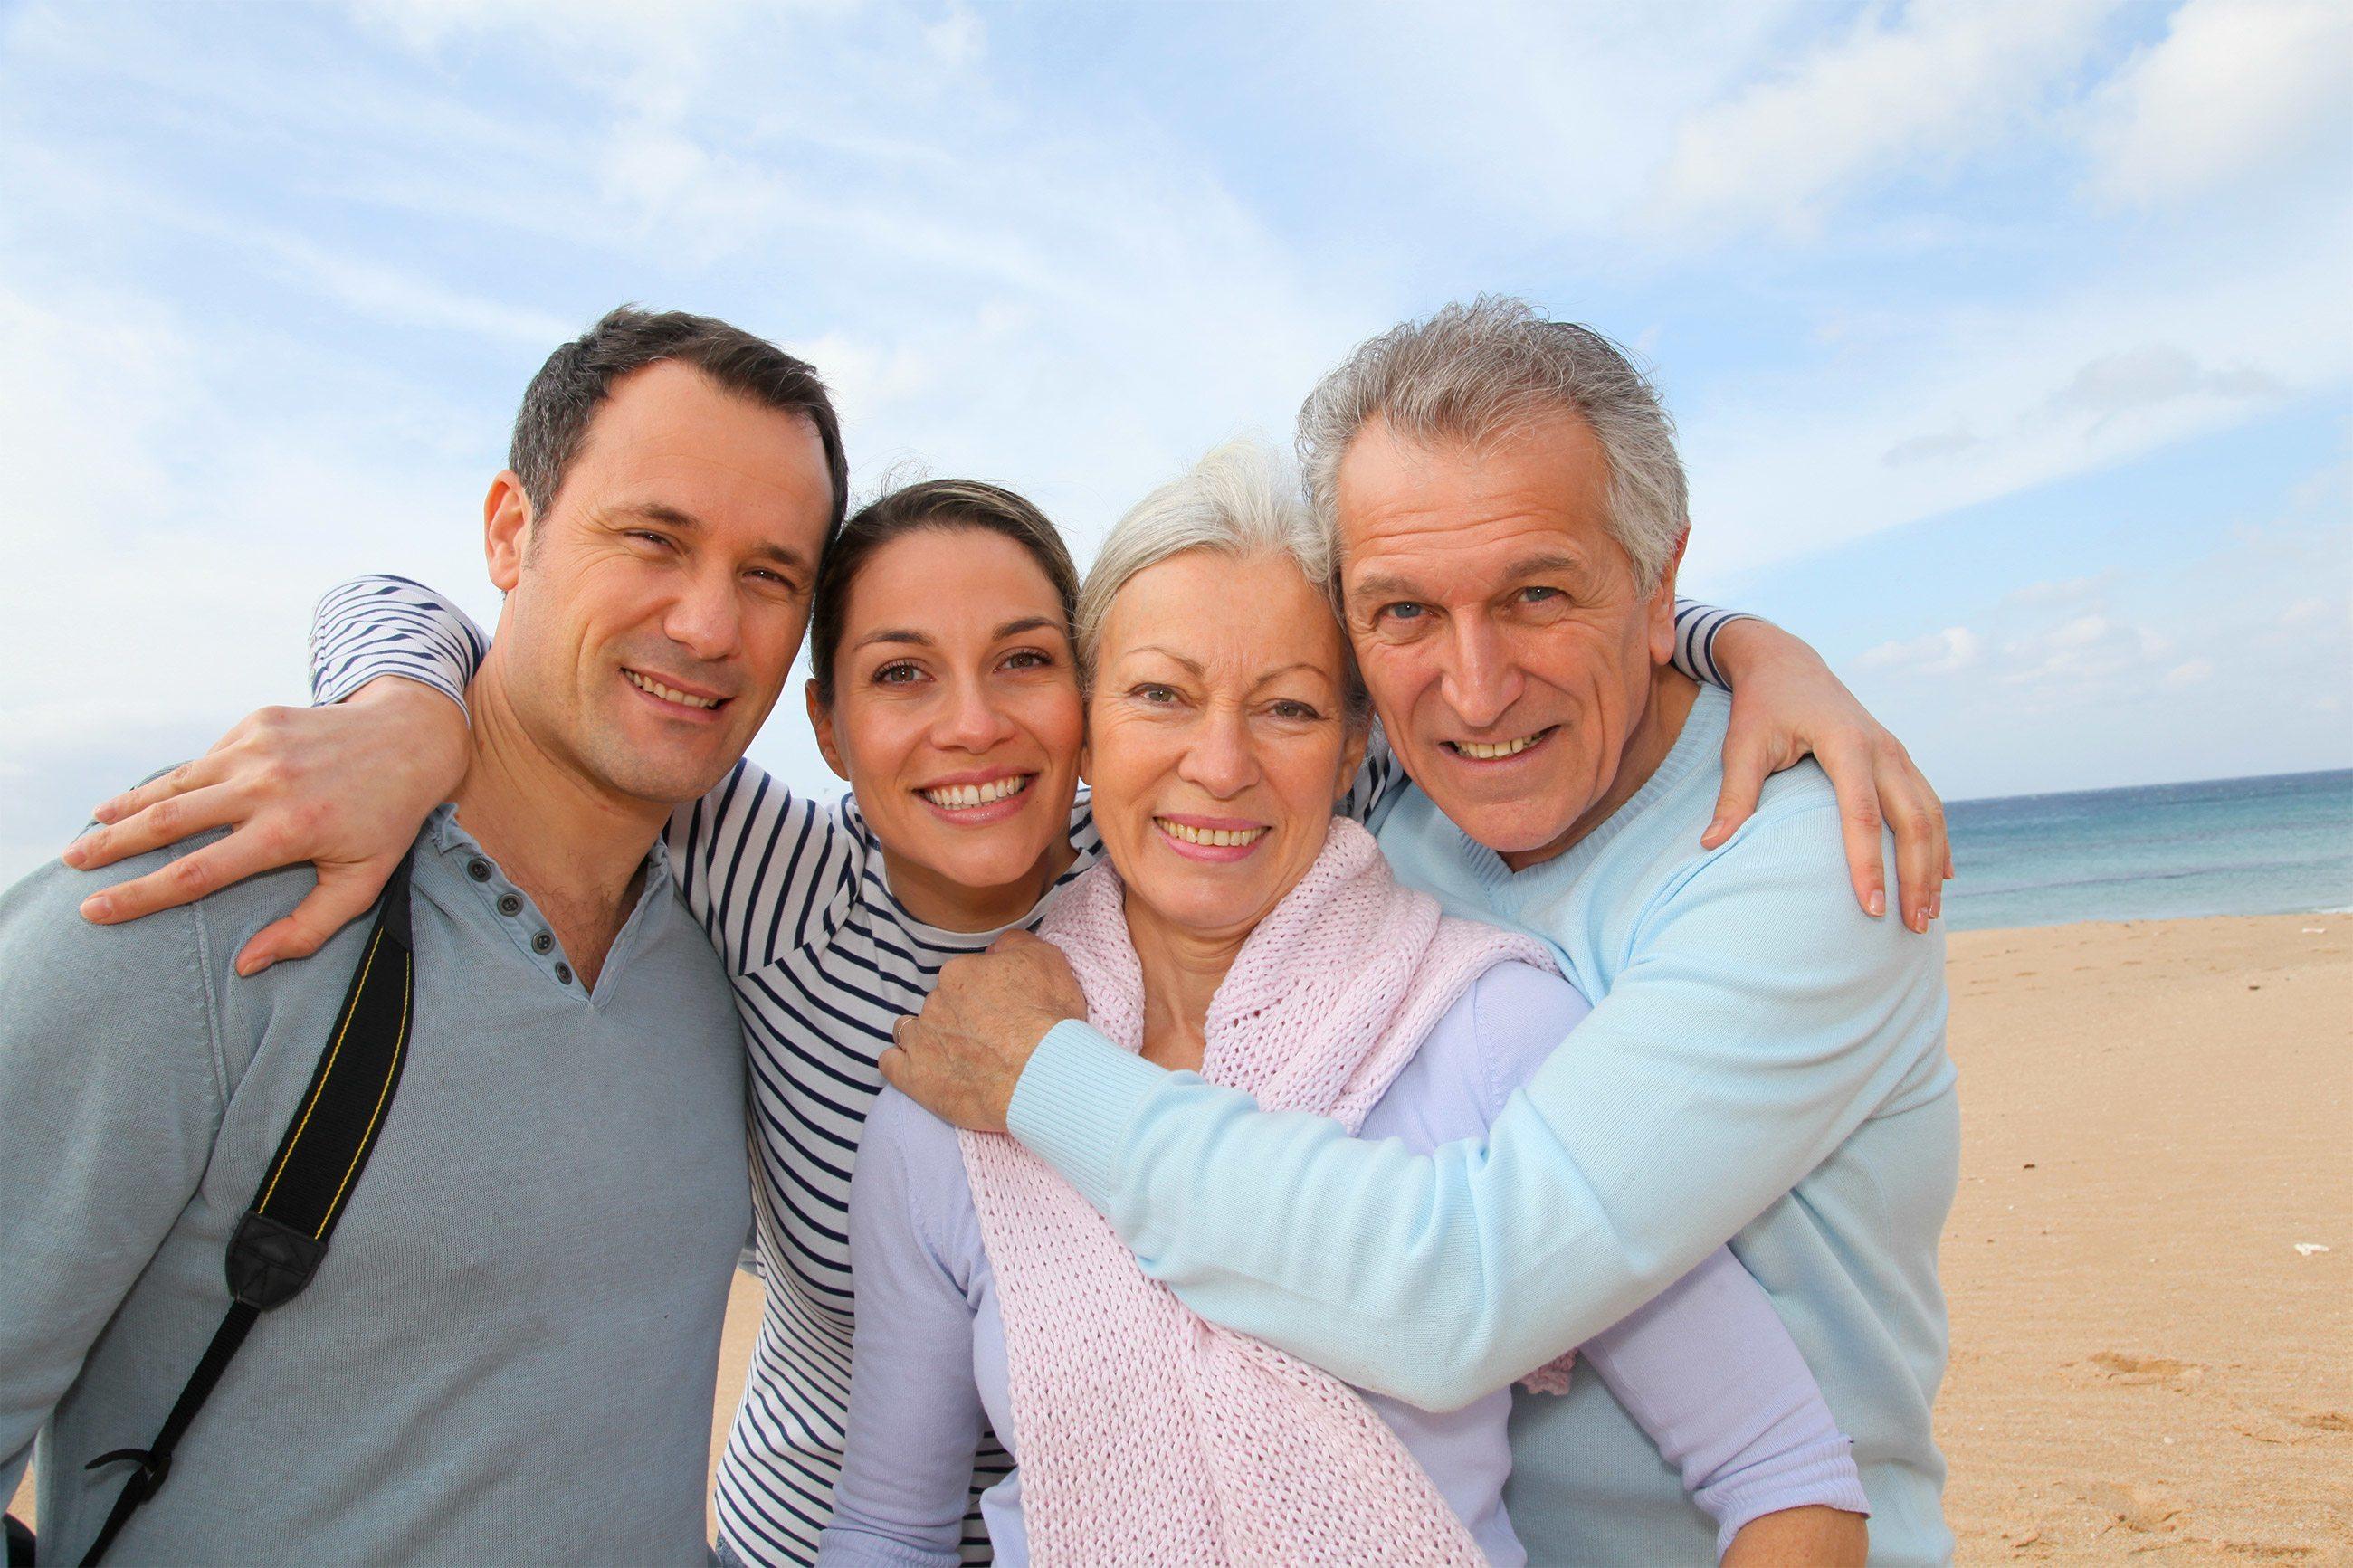 happy-healthy-people PEMD Patients